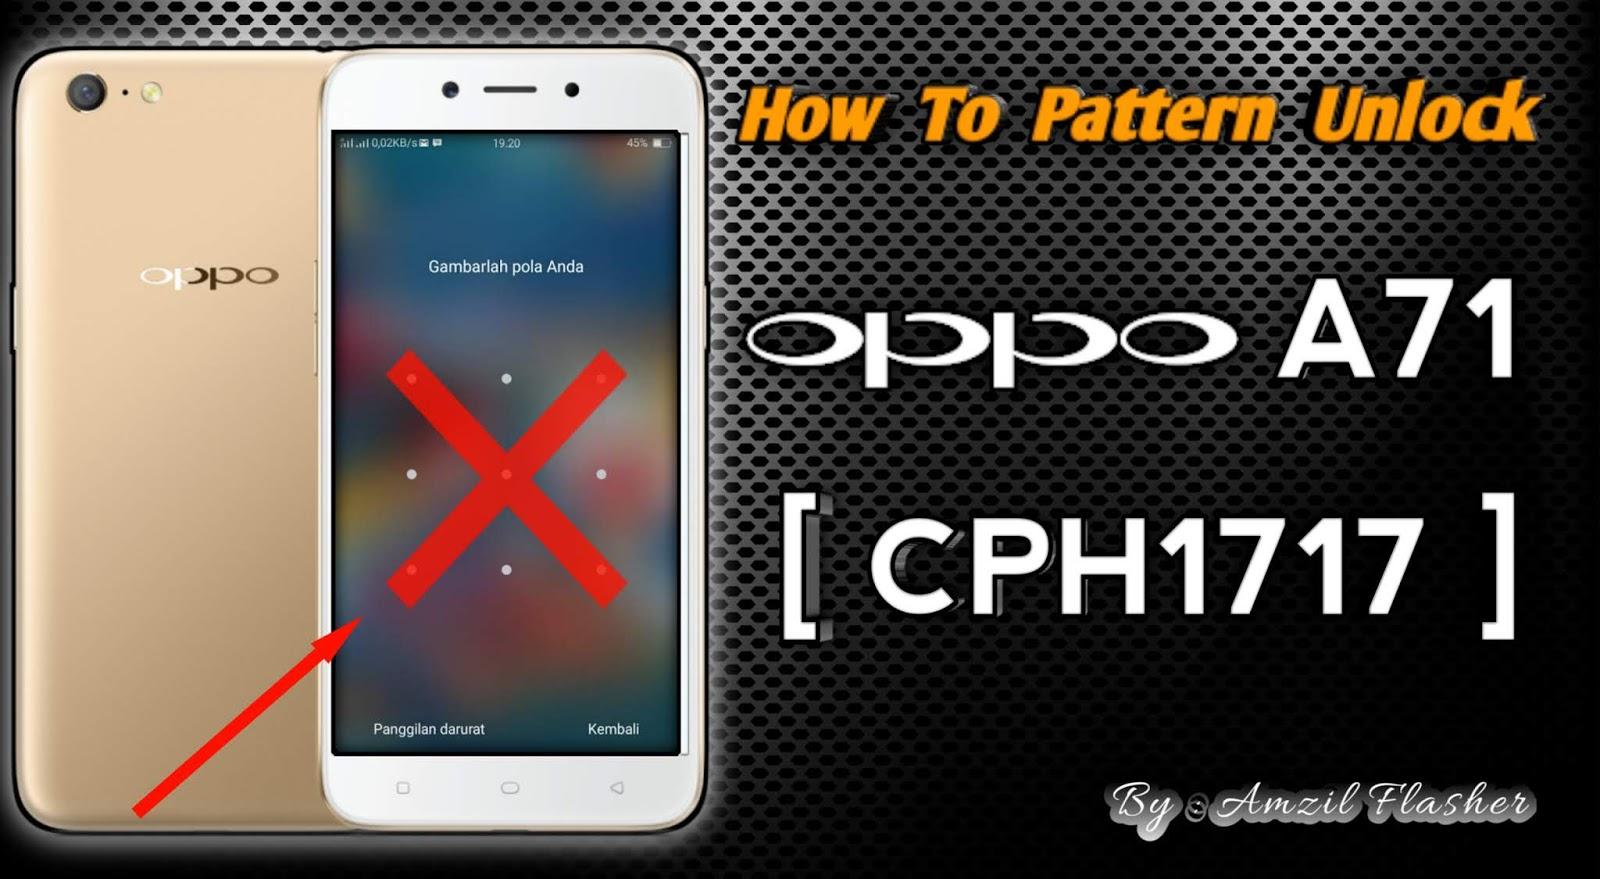 Cara Bypass Pola  Sandi Oppo A71  Cph1717   Tested 1000  Work